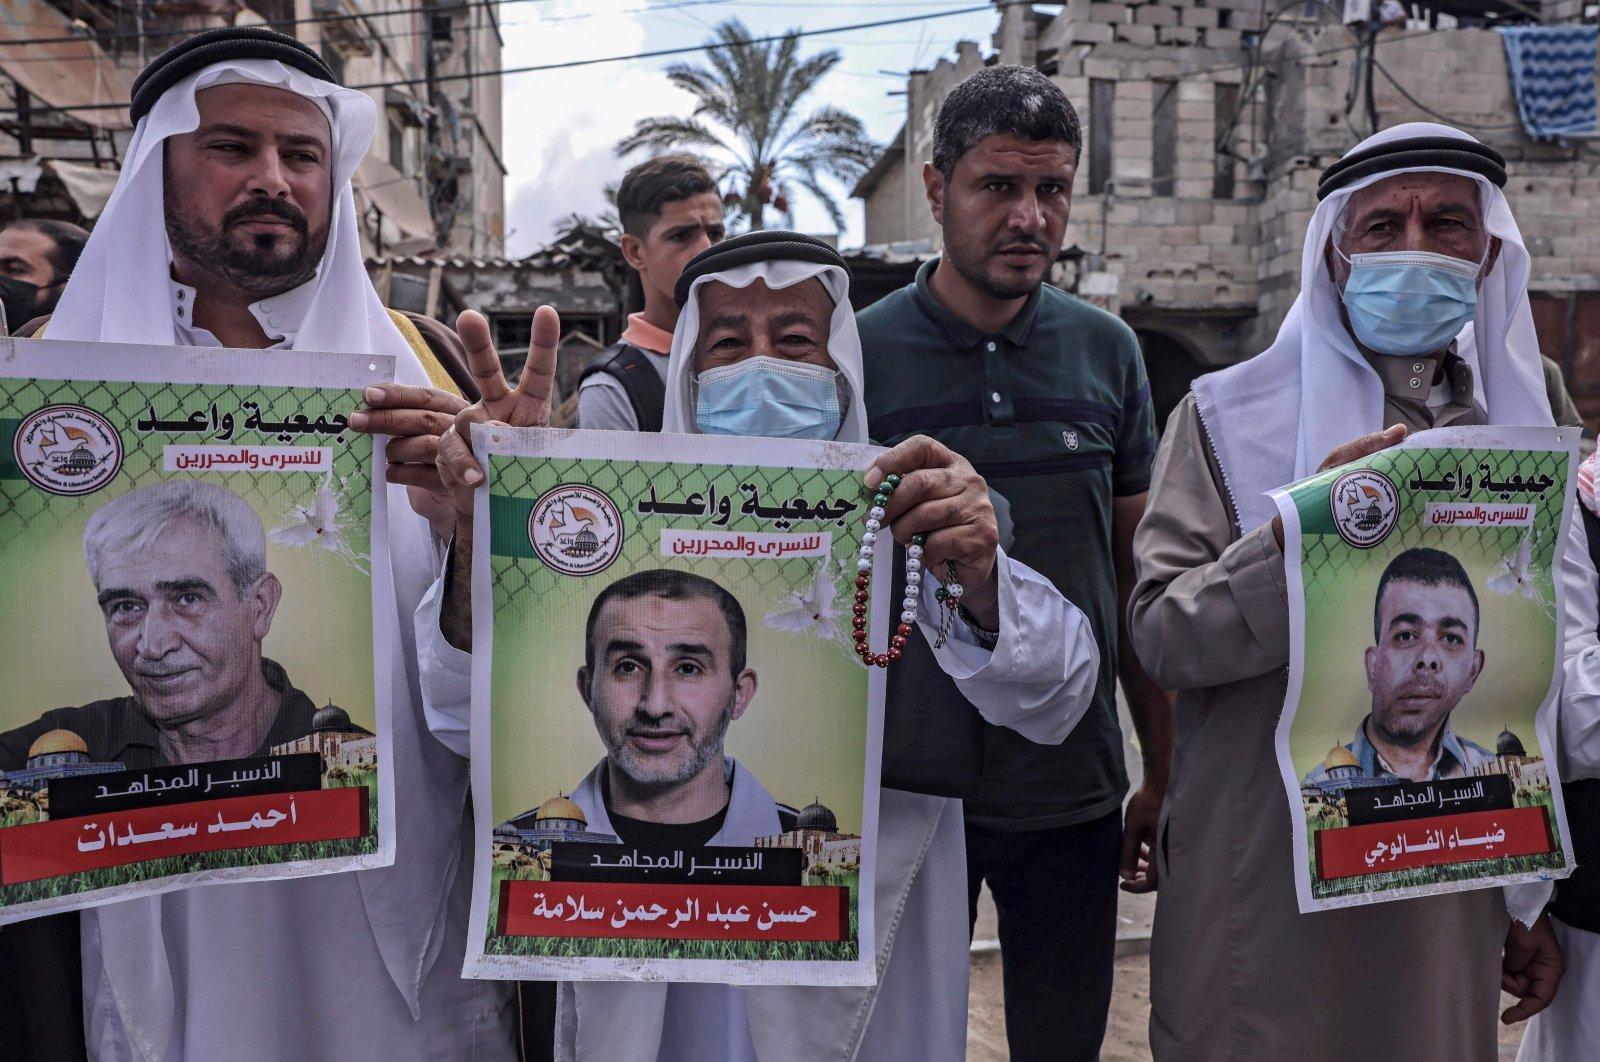 Men march in solidarity with Palestinian prisoners in Israeli jails, in Khan Yunis, Gaza Strip, Palestine, Sept. 27, 2021. (AFP Photo)